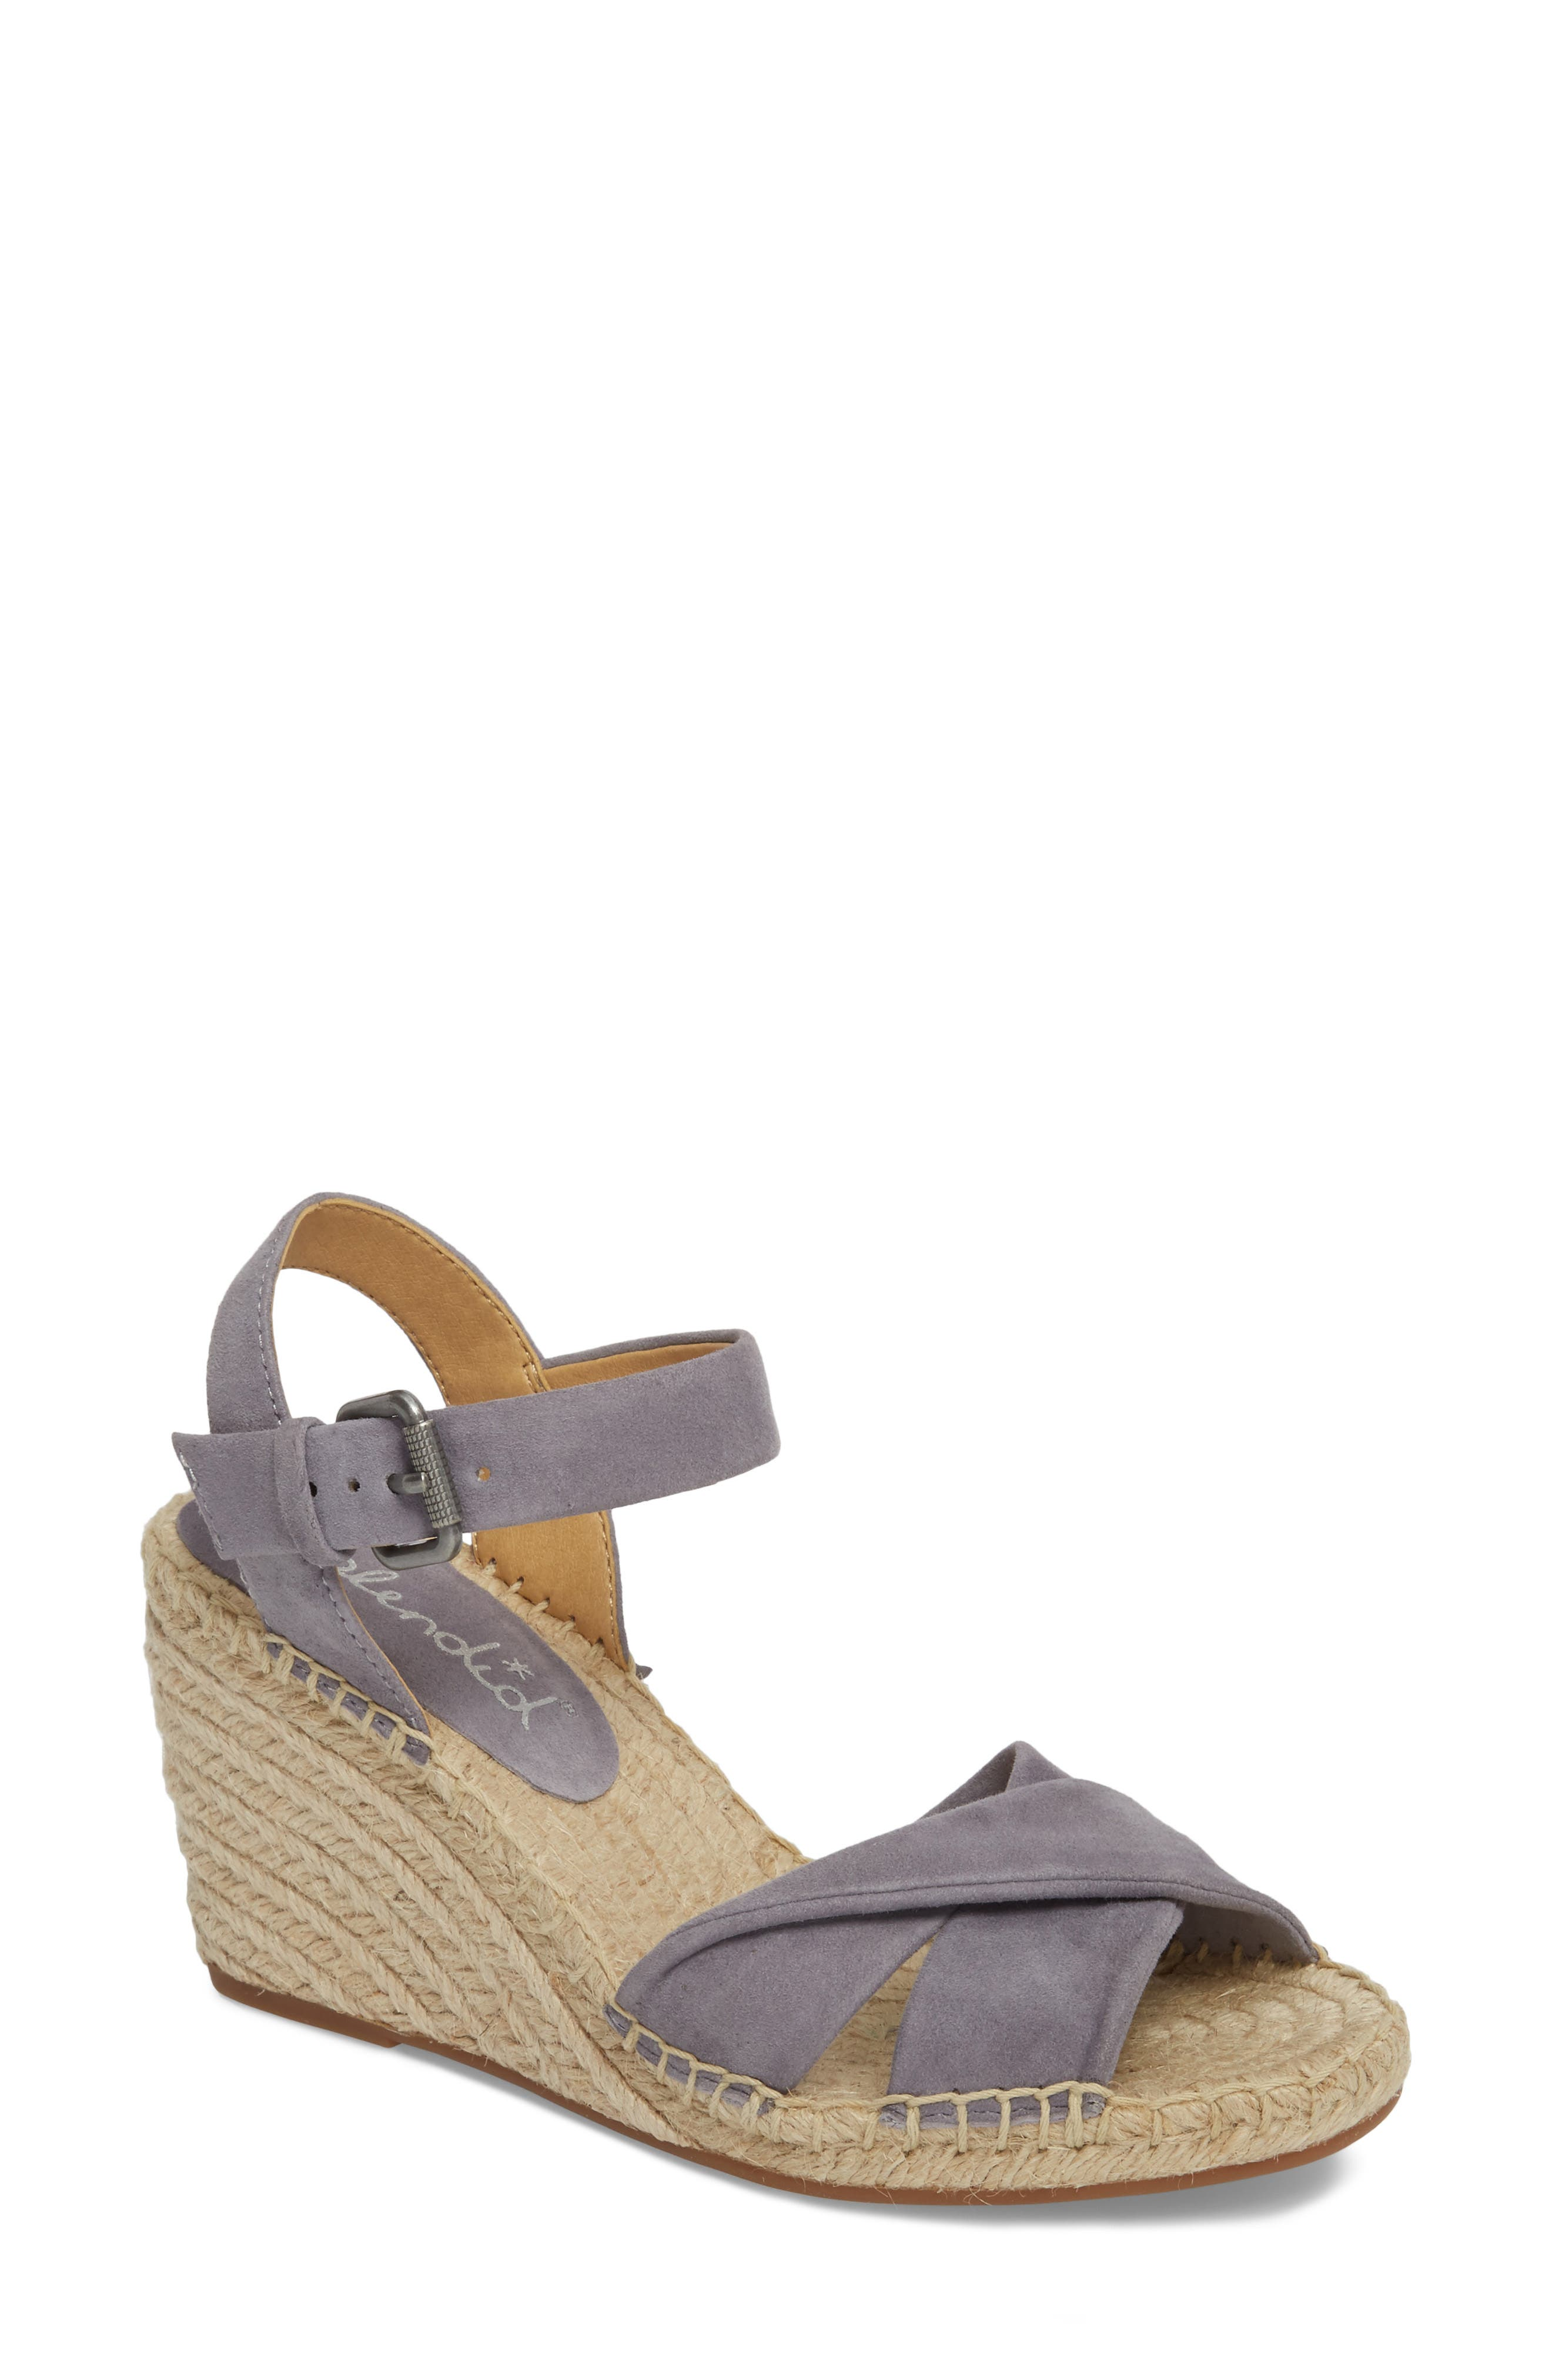 Fairfax Espadrille Wedge Sandal,                         Main,                         color, STEEL GREY SUEDE